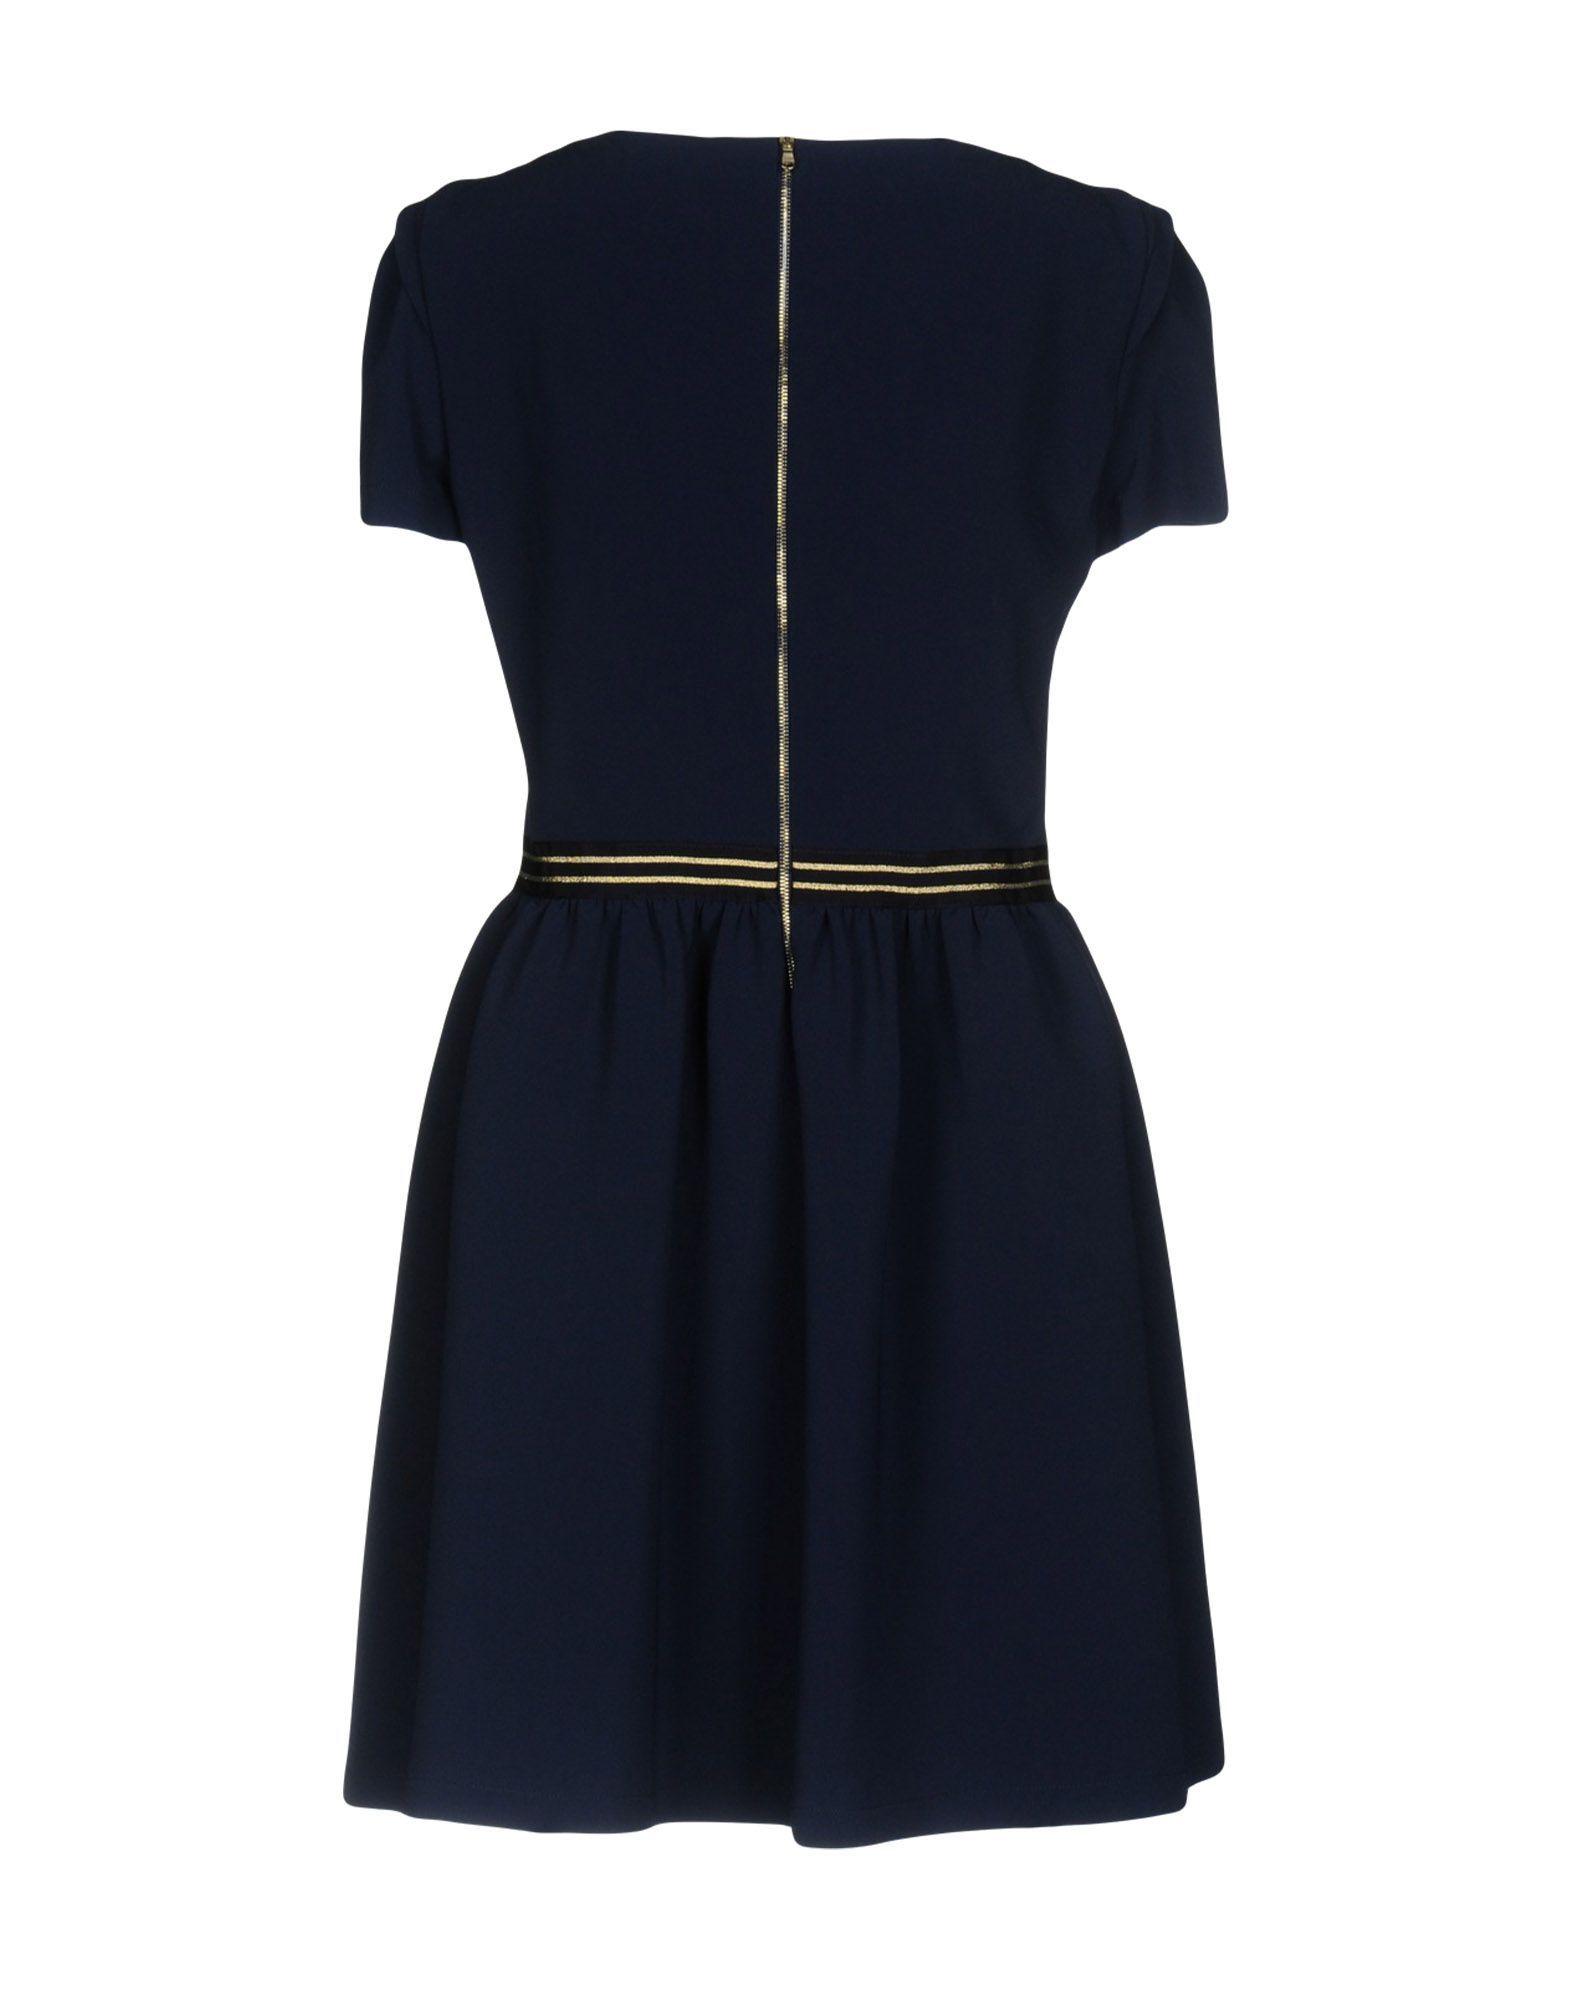 Patrizia Pepe Dark Blue Short Sleeve Dress